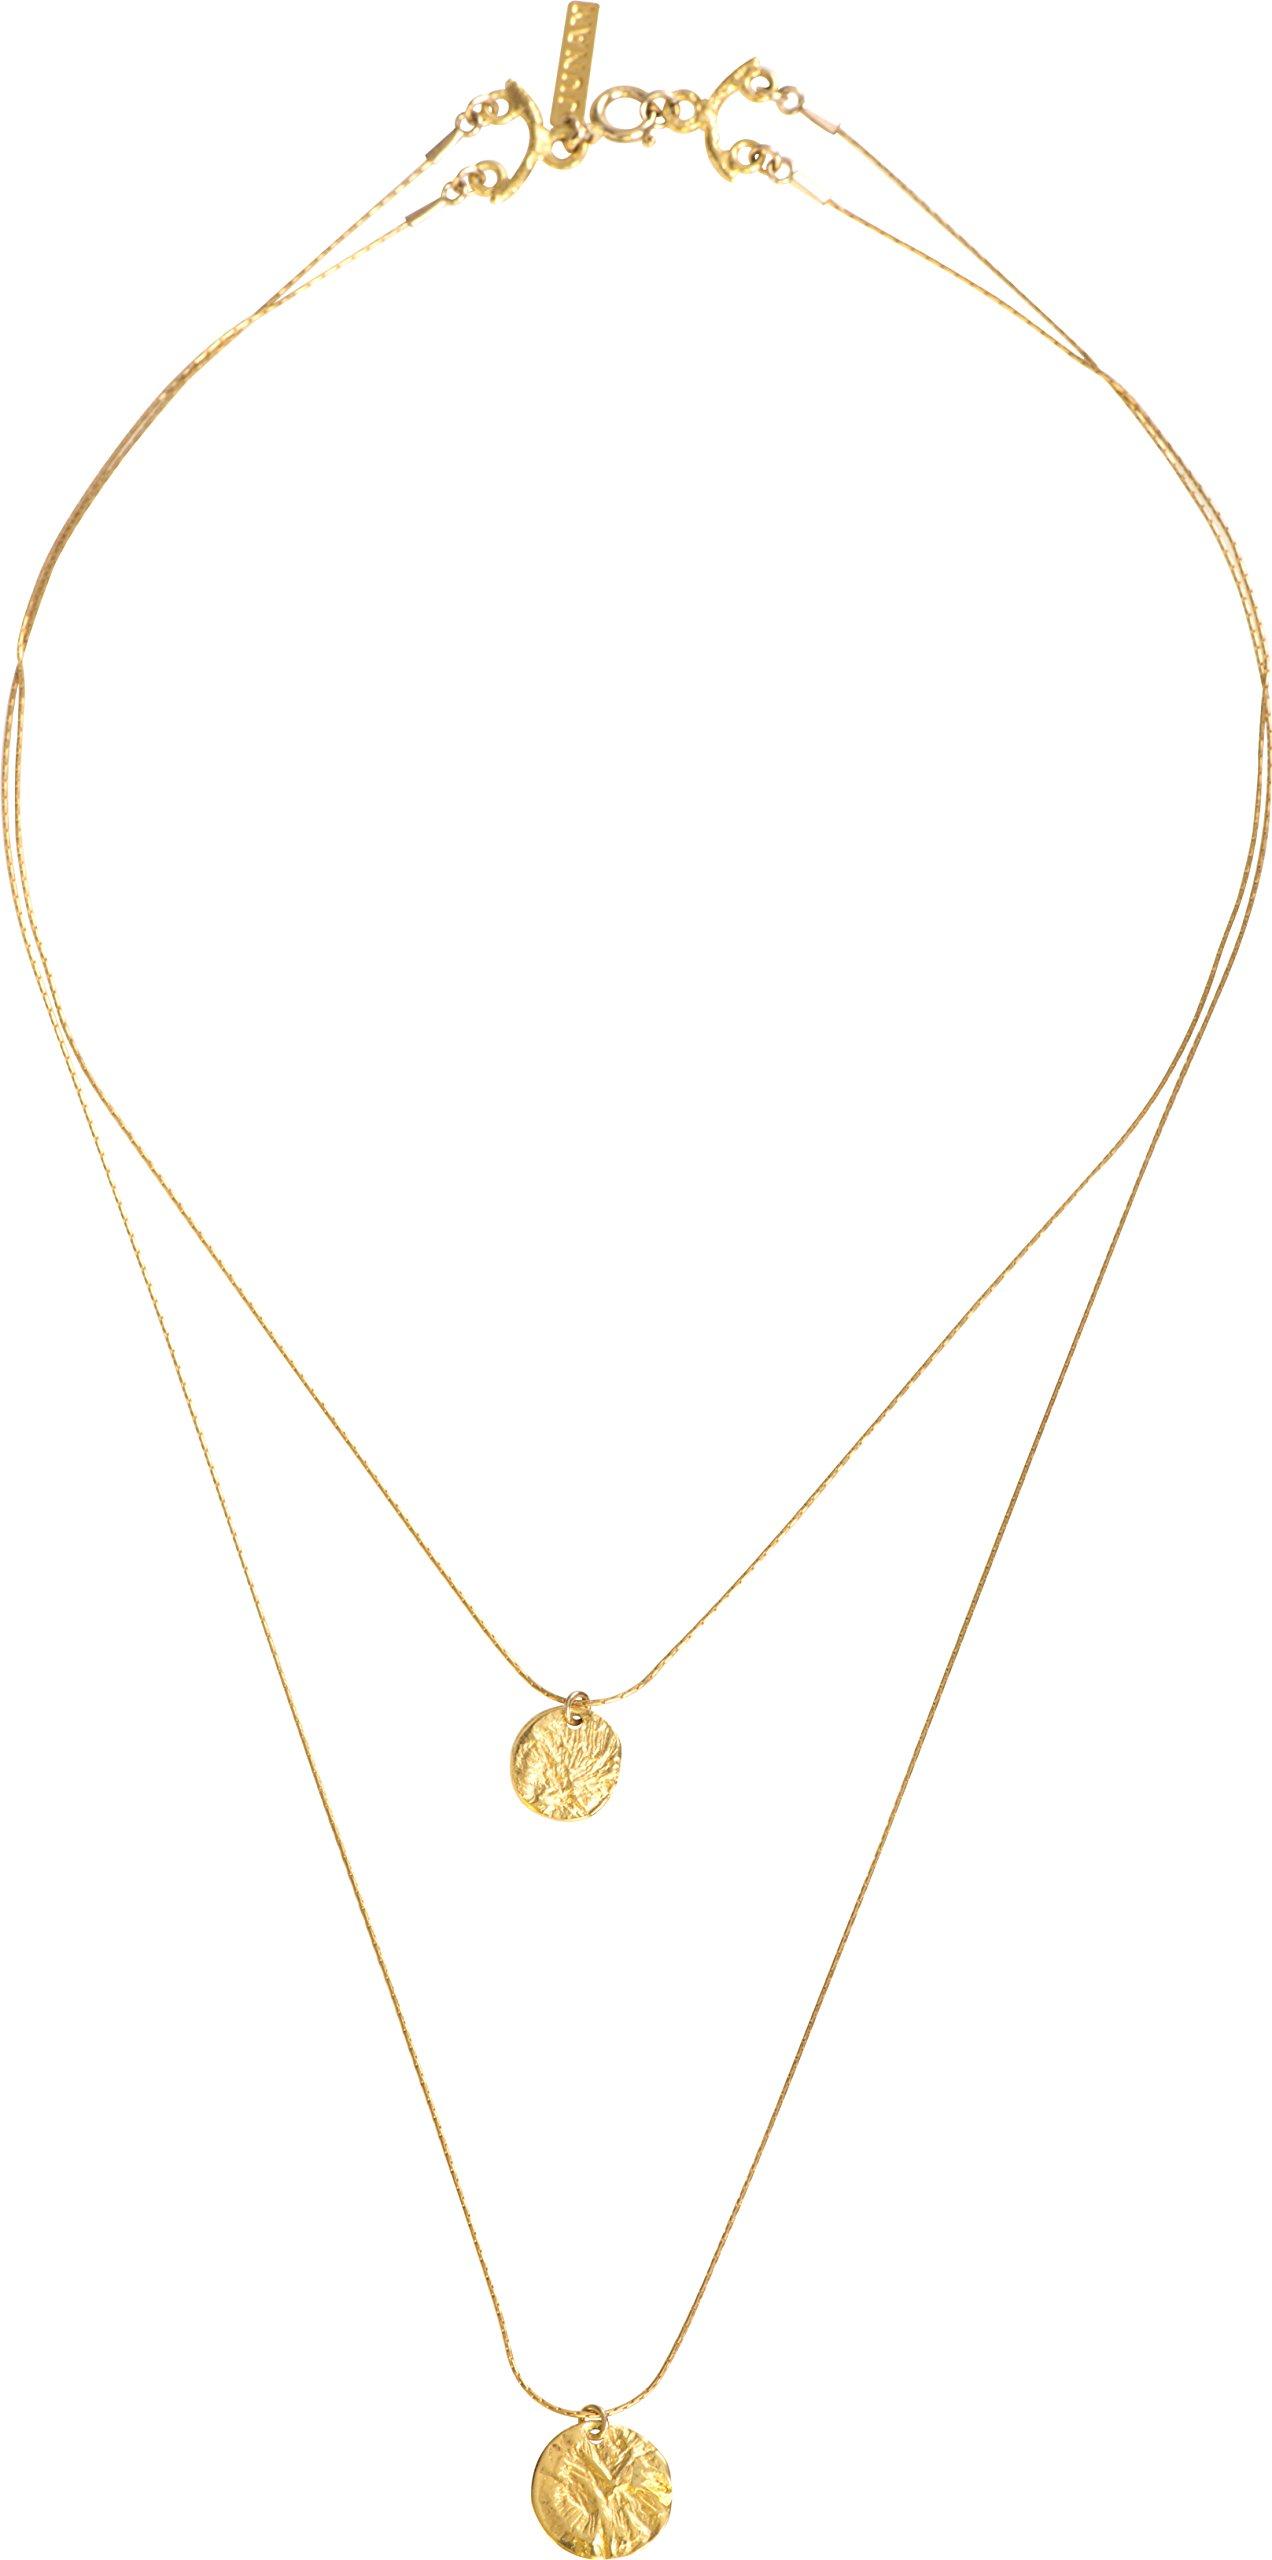 JUNAM Women's 18k Gold Plated Double Necklace Elegant Bridal Jewelry - 100% Handmade